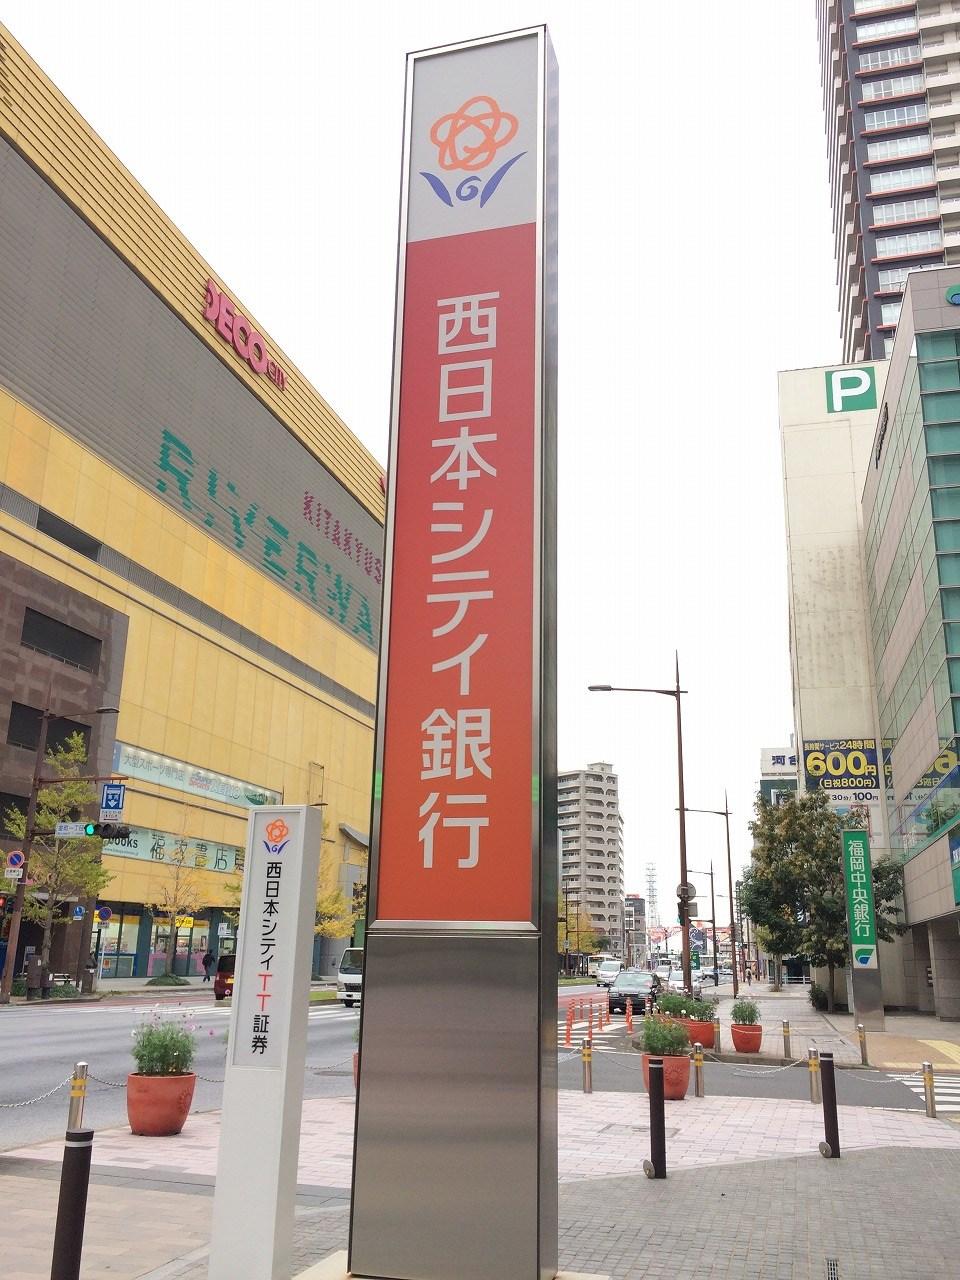 銀行:西日本シティ銀行 黒原 833m